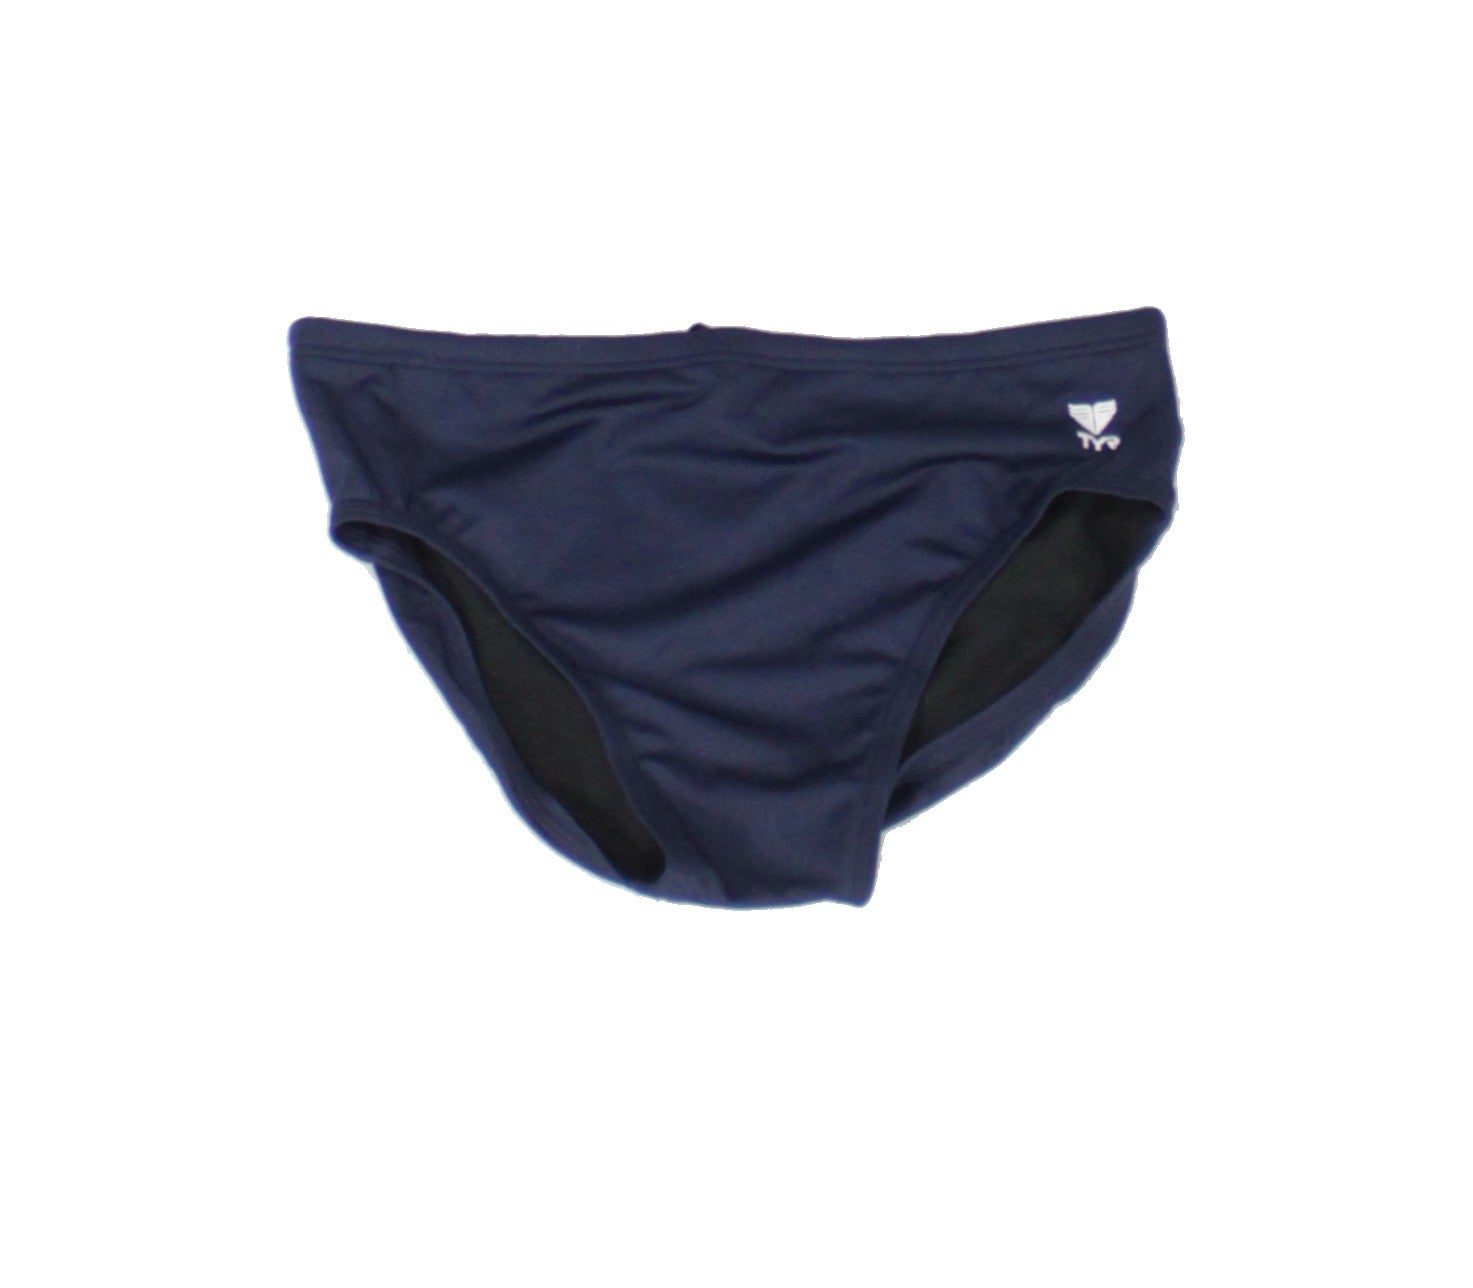 TYR Mens Swimwear Navy Blue Size 38 Swim Briefs Durafast Performance